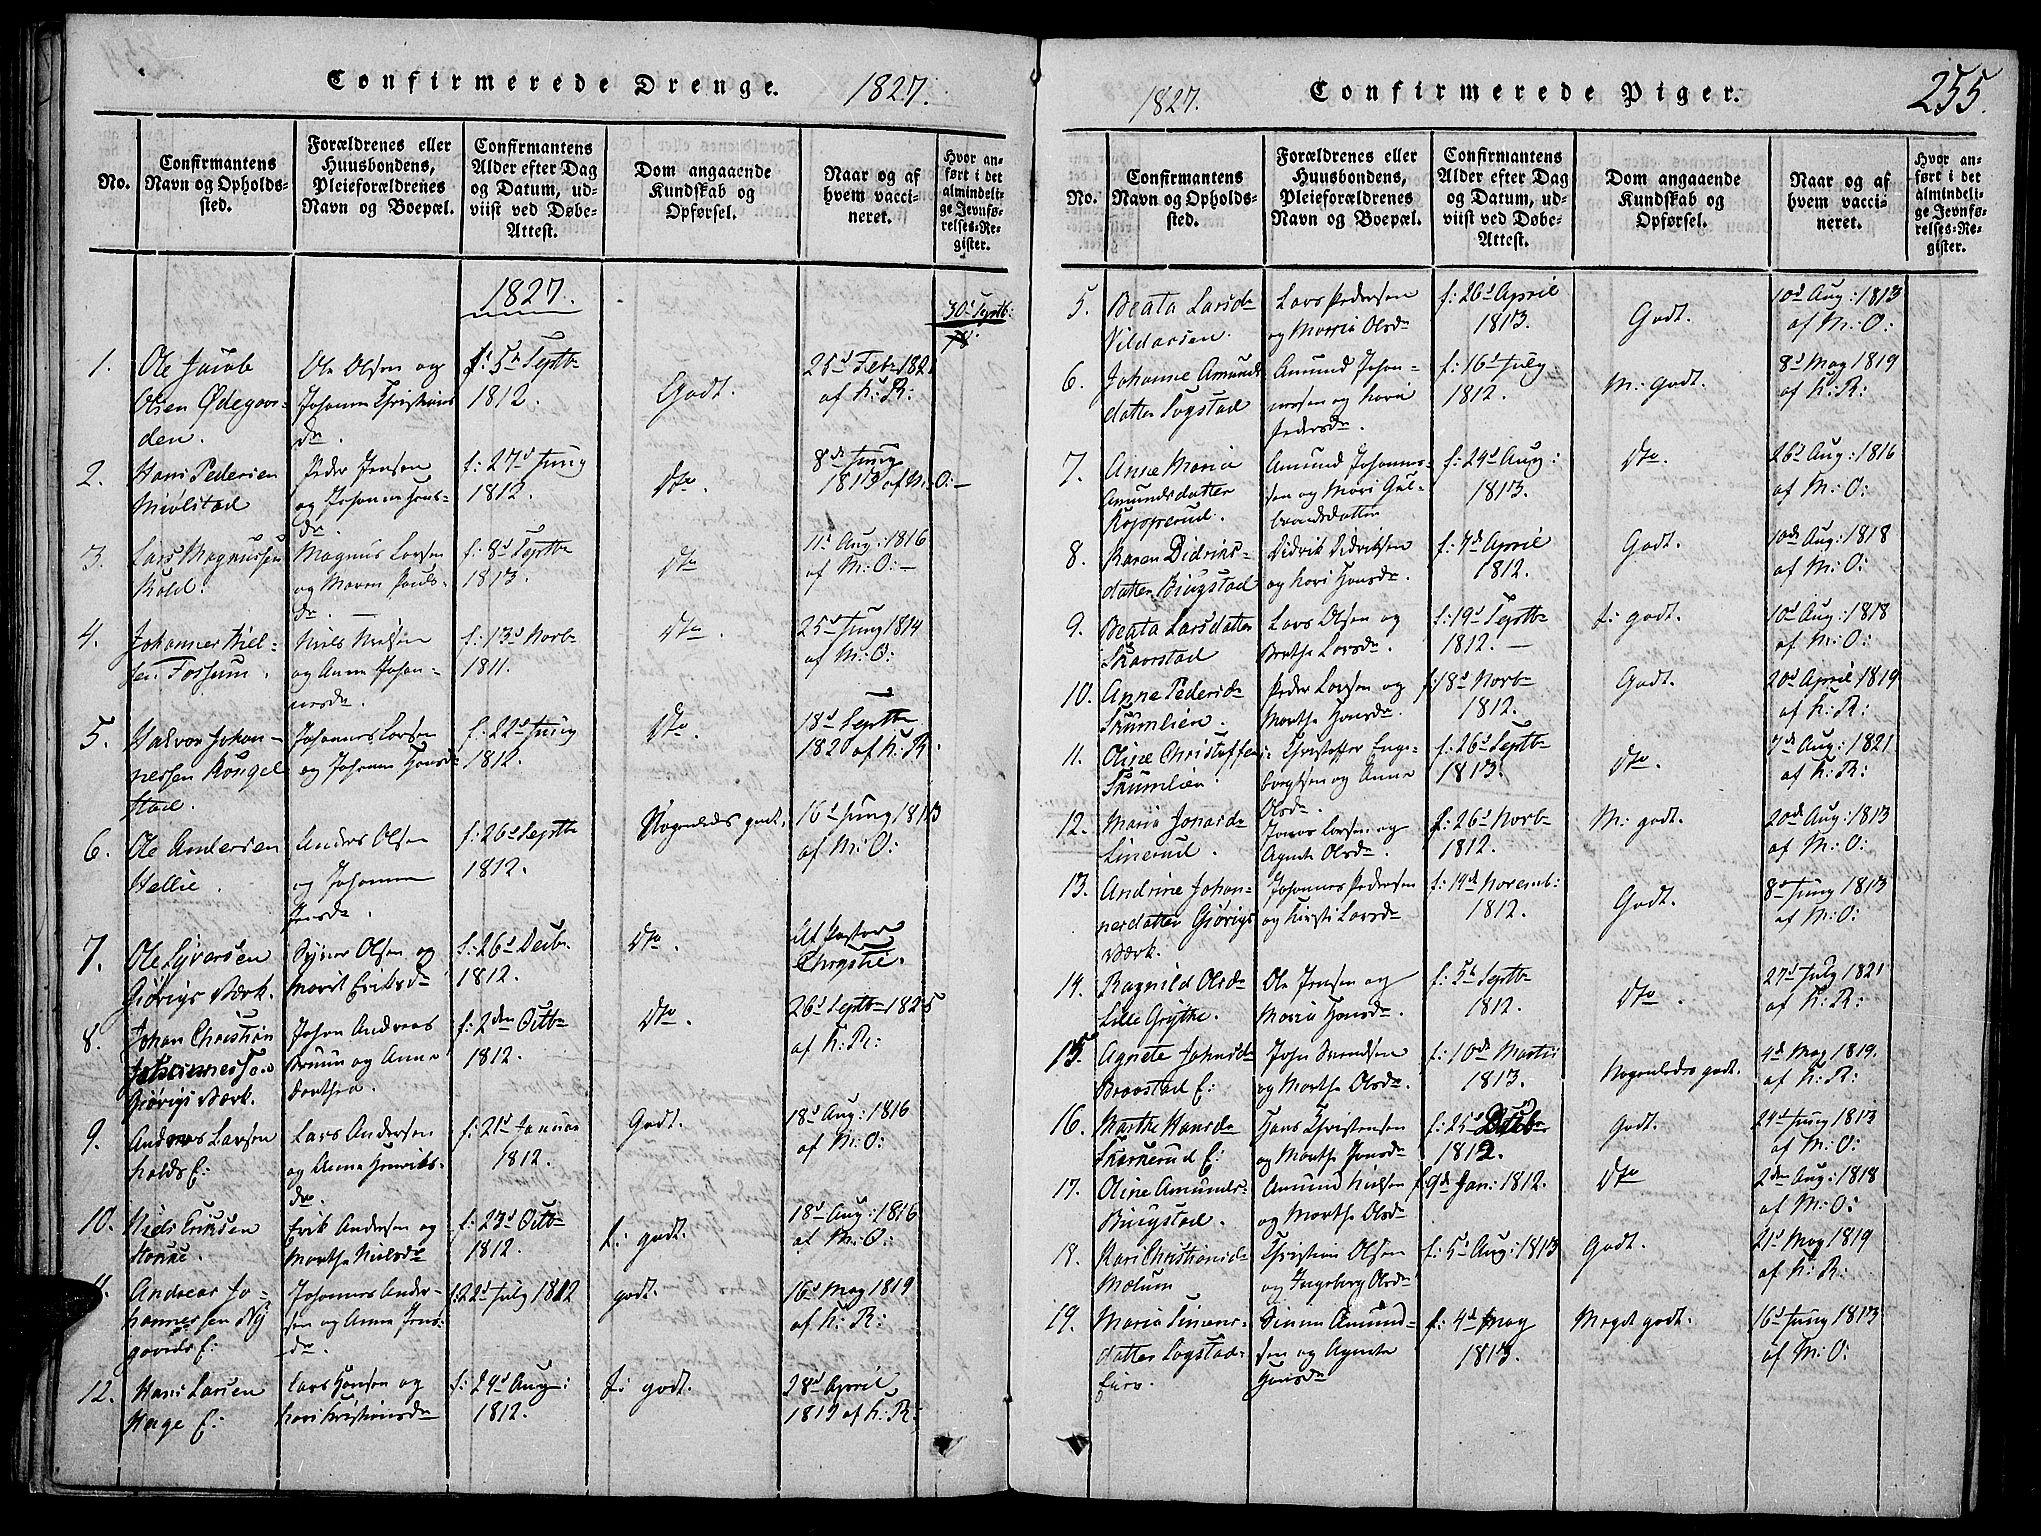 SAH, Vardal prestekontor, H/Ha/Haa/L0004: Ministerialbok nr. 4, 1814-1831, s. 255